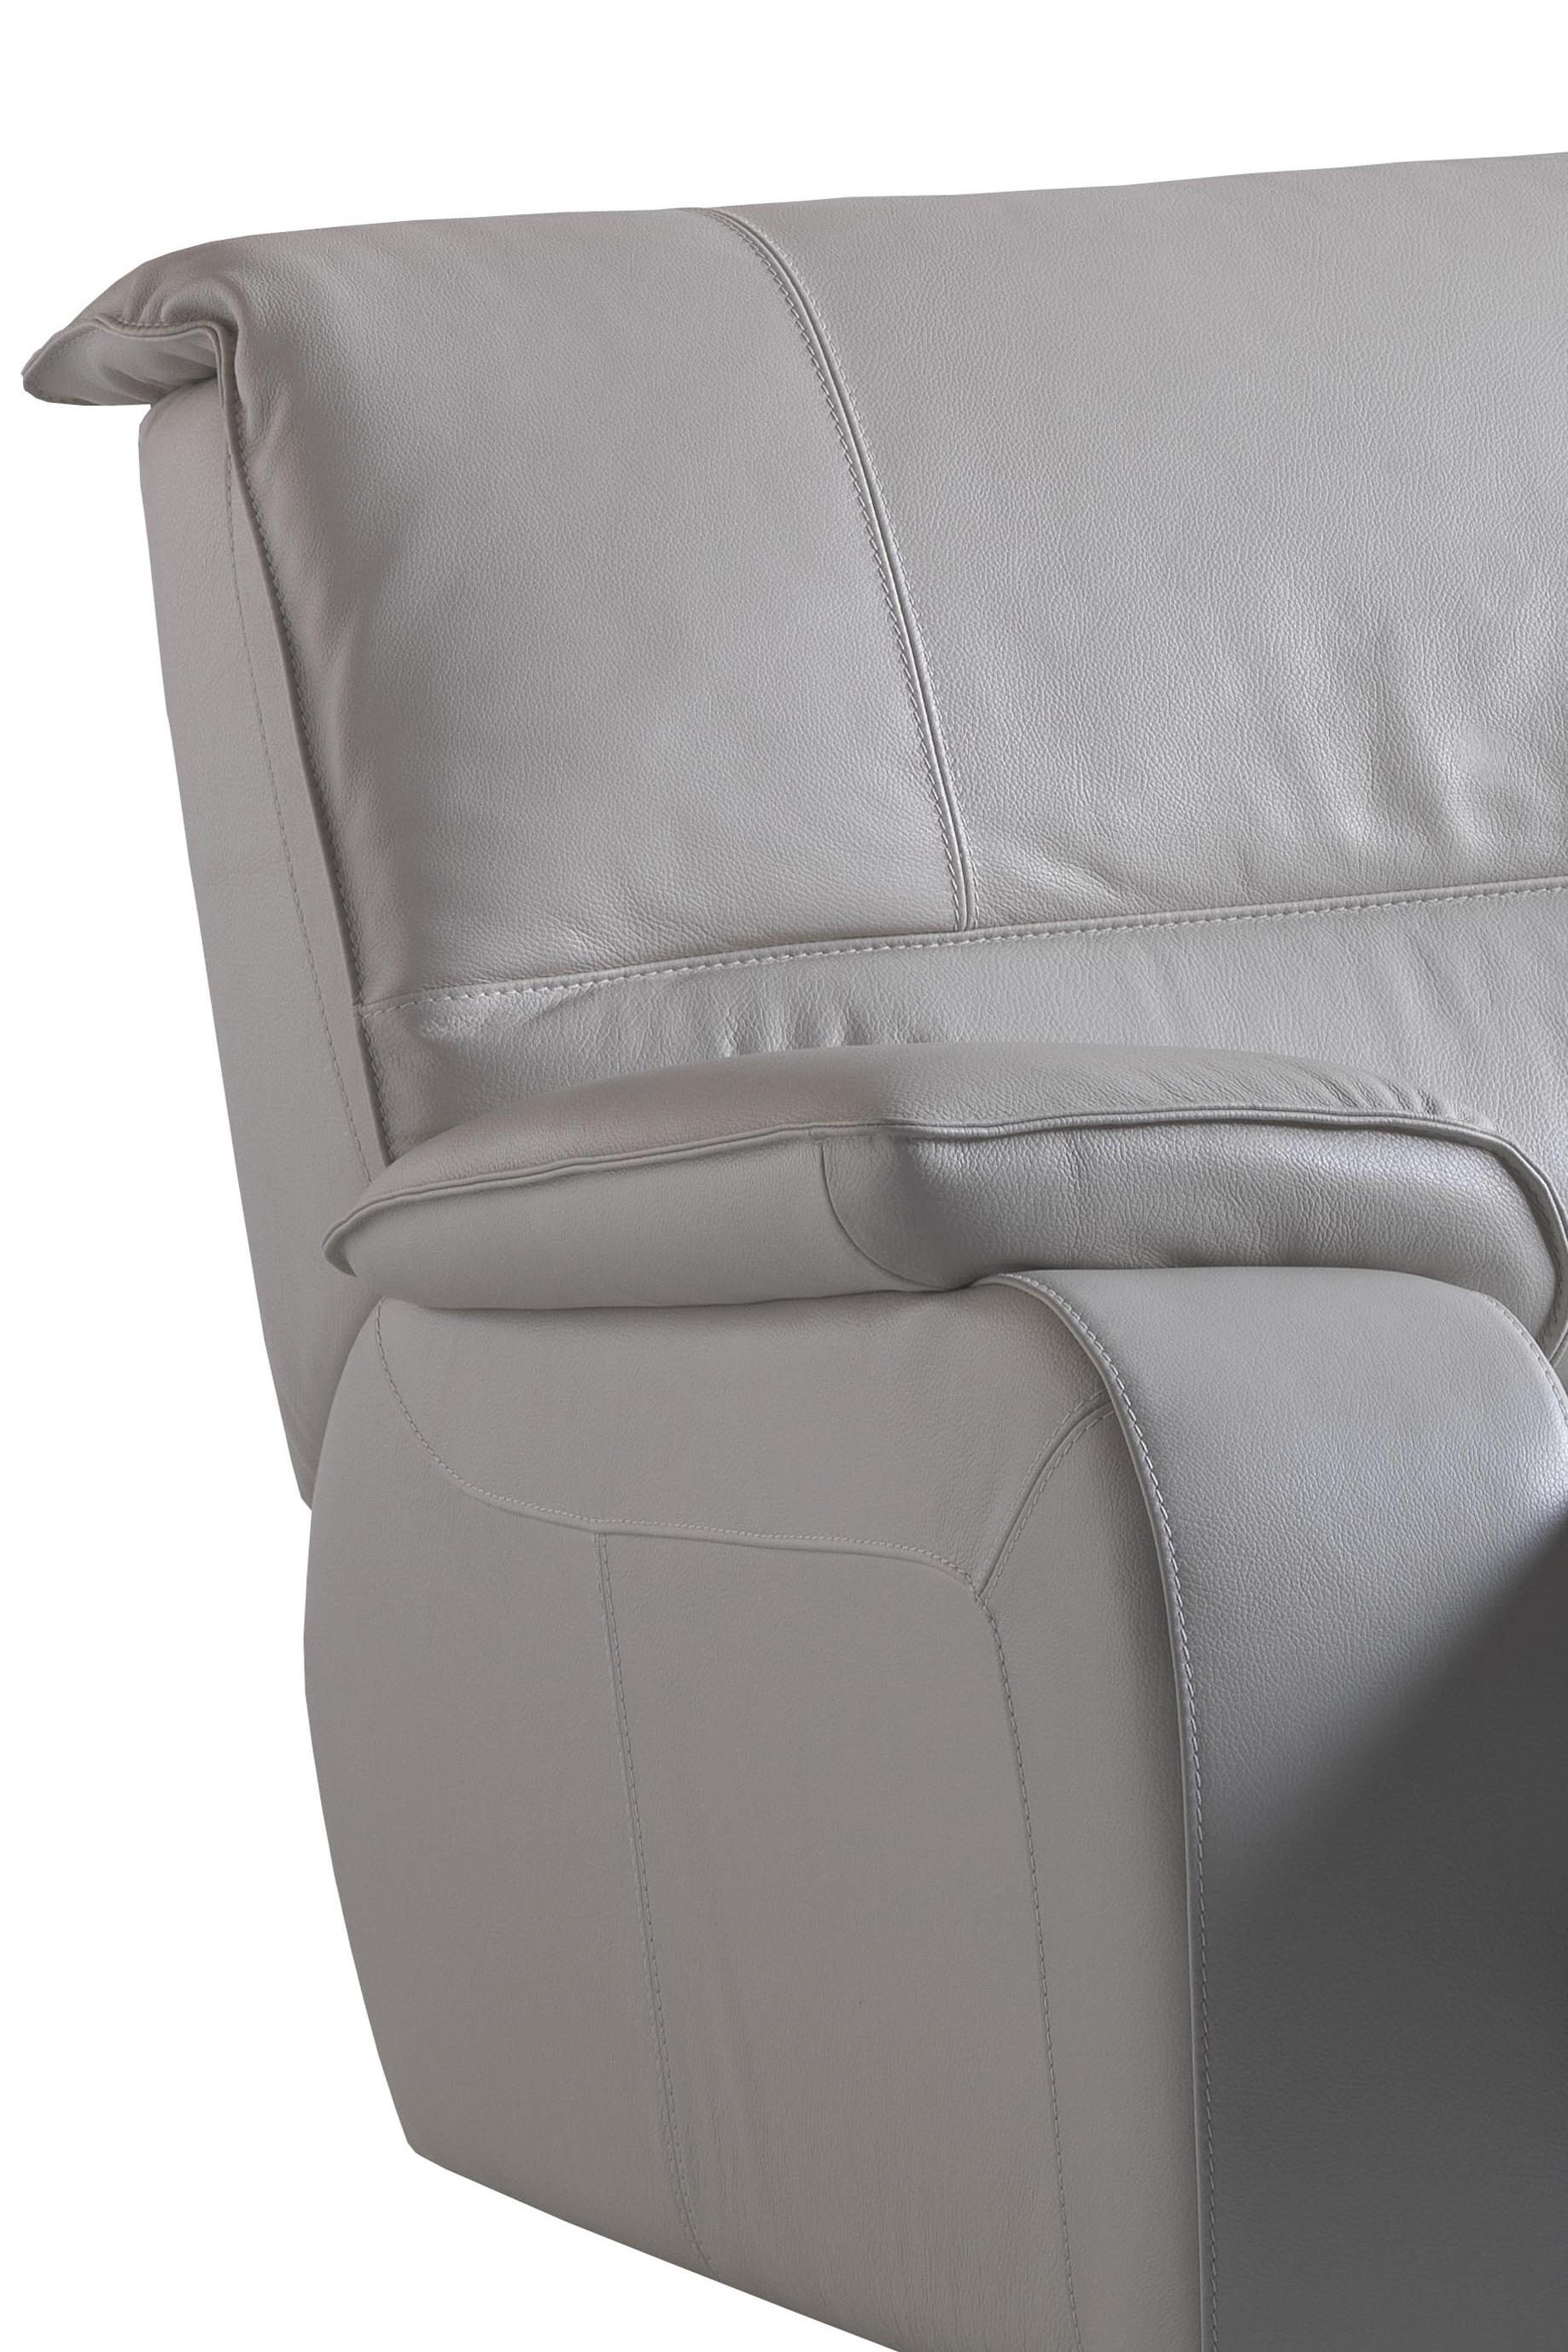 Chateau D Ax C65E Contemporary 2 Seat Reclining Sofa